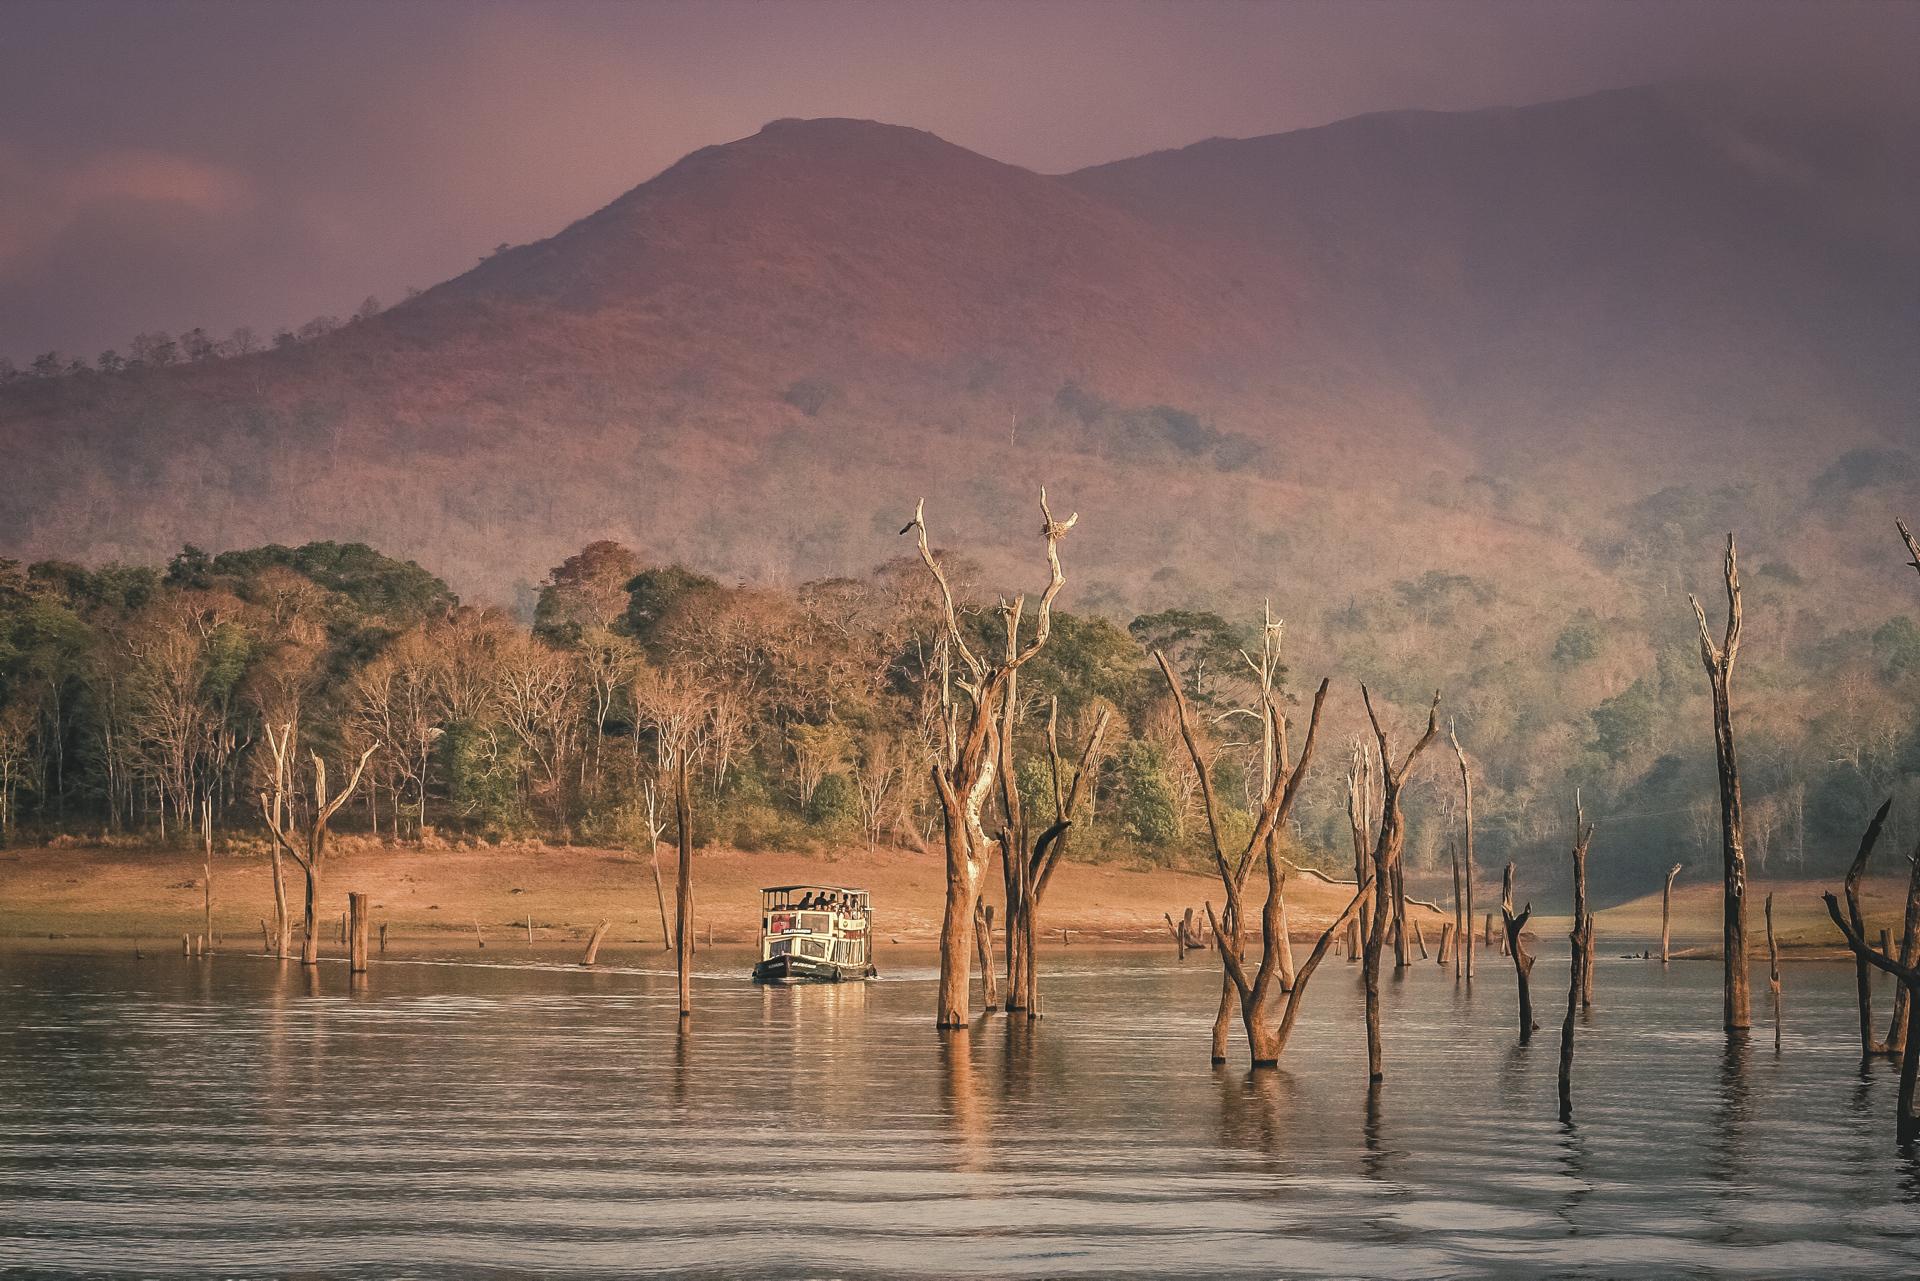 Bootsfahrt auf dem Thekaddy Lake im Periyar Nationalpark